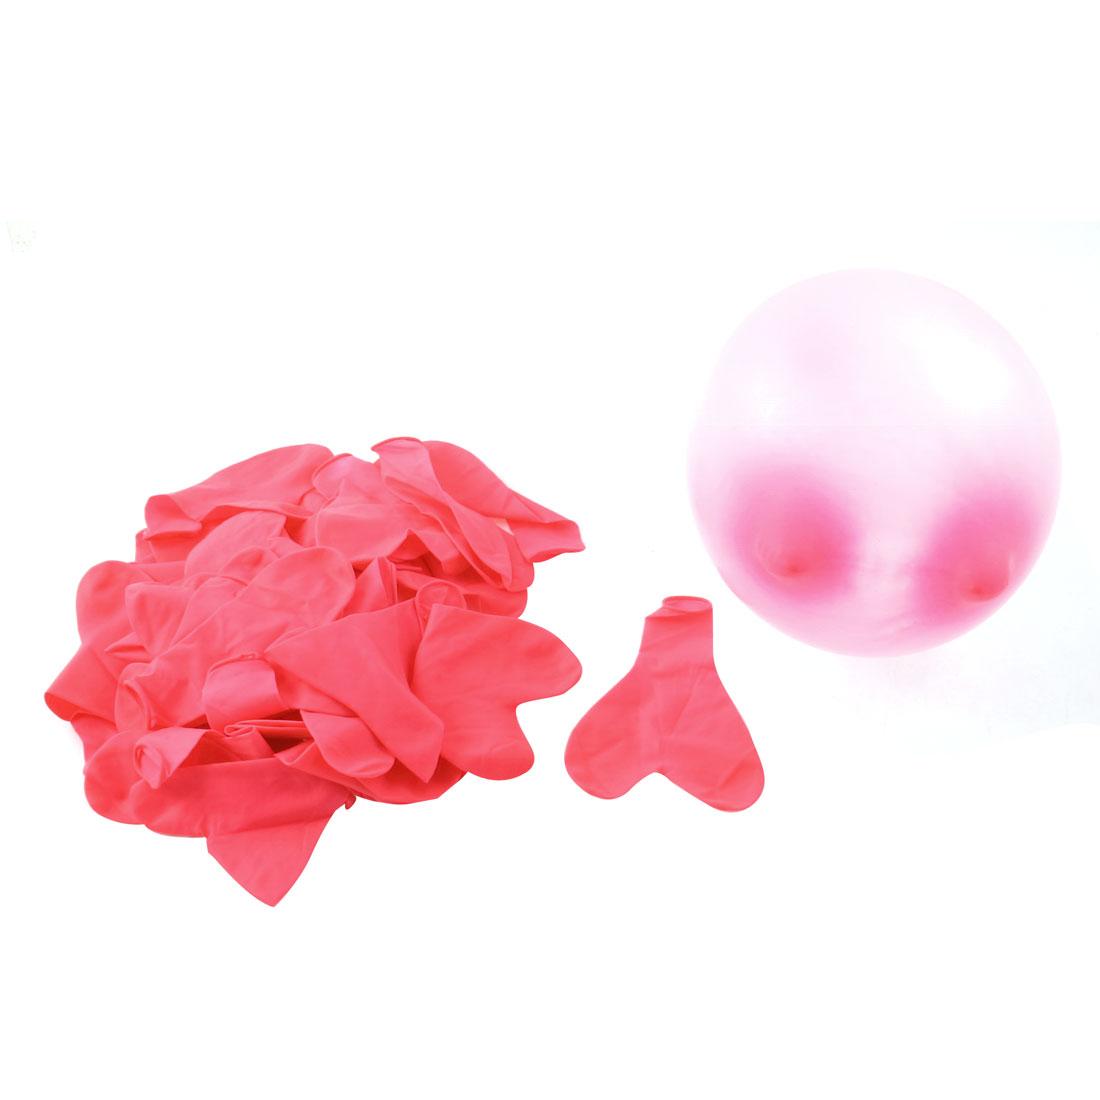 Latex Heart Shape Balloons Wedding Party Birthday Anniversary Decor 41 Pcs Pink